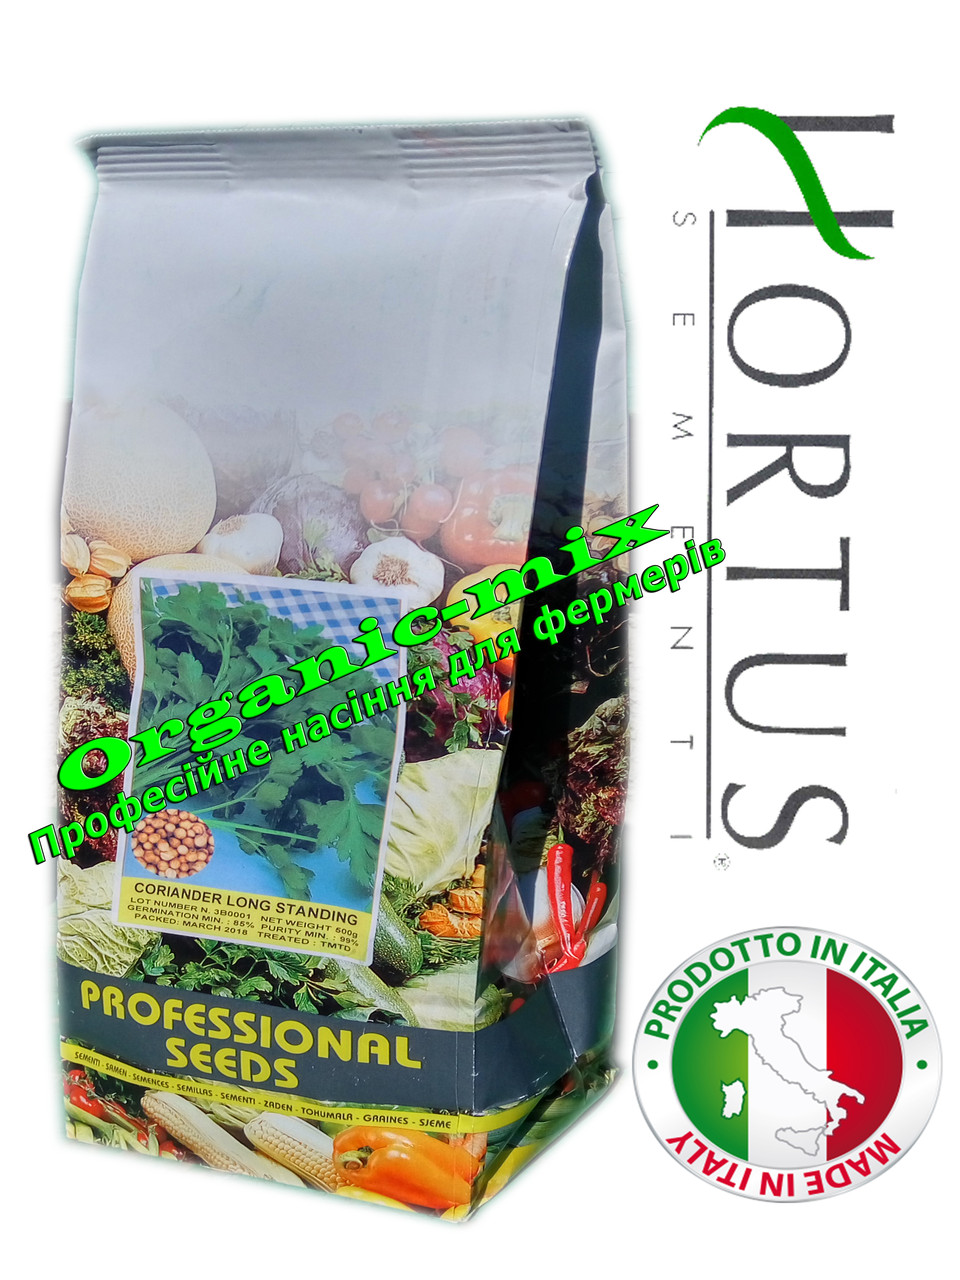 Кориандр (Кинза) Лонг Стендинг / LONG STANDING, Италия Hortus (пакет 500 грамм)